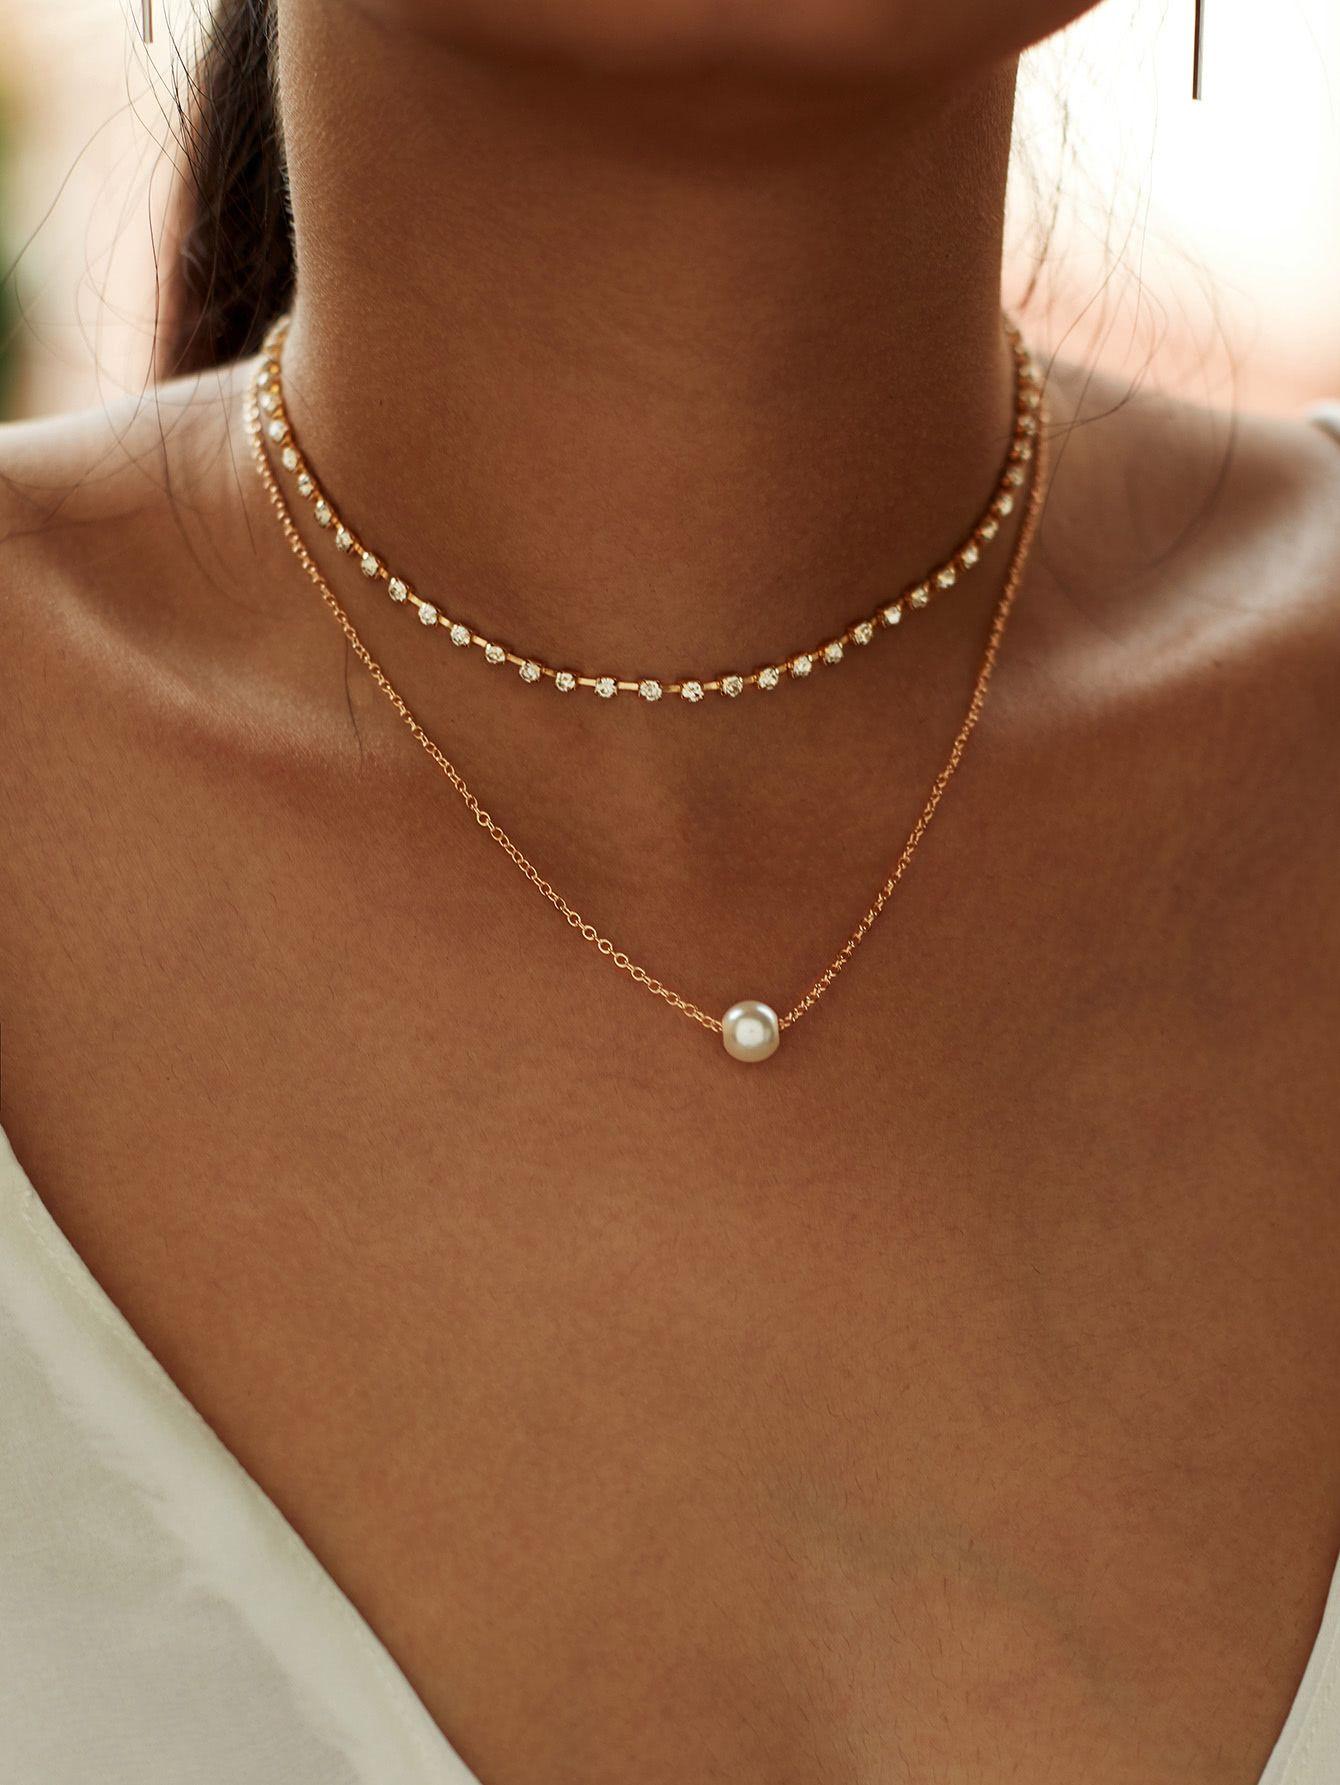 5c24dbed621c4 Faux Pearl Pendant Rhinestone Choker Necklace 2pcs -SheIn(Sheinside ...